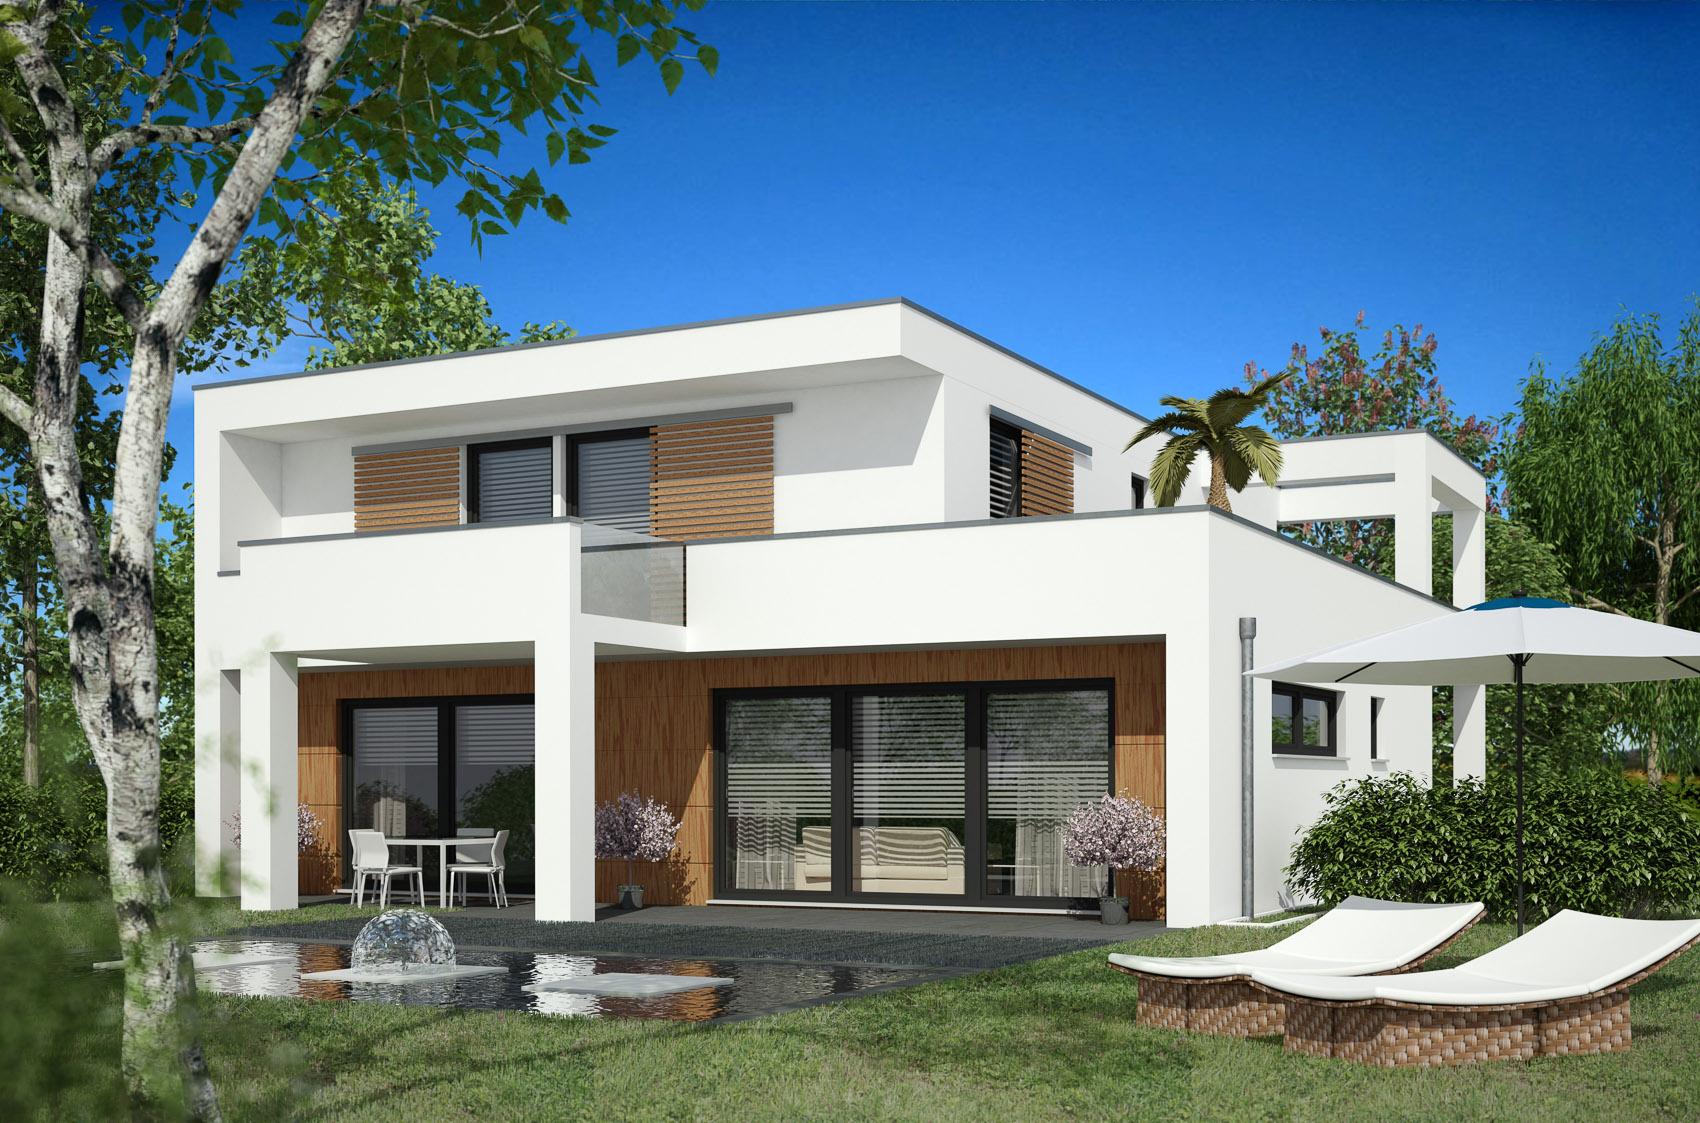 Fertigteilhaus modern  Fertighaus | Holzbau Roscher